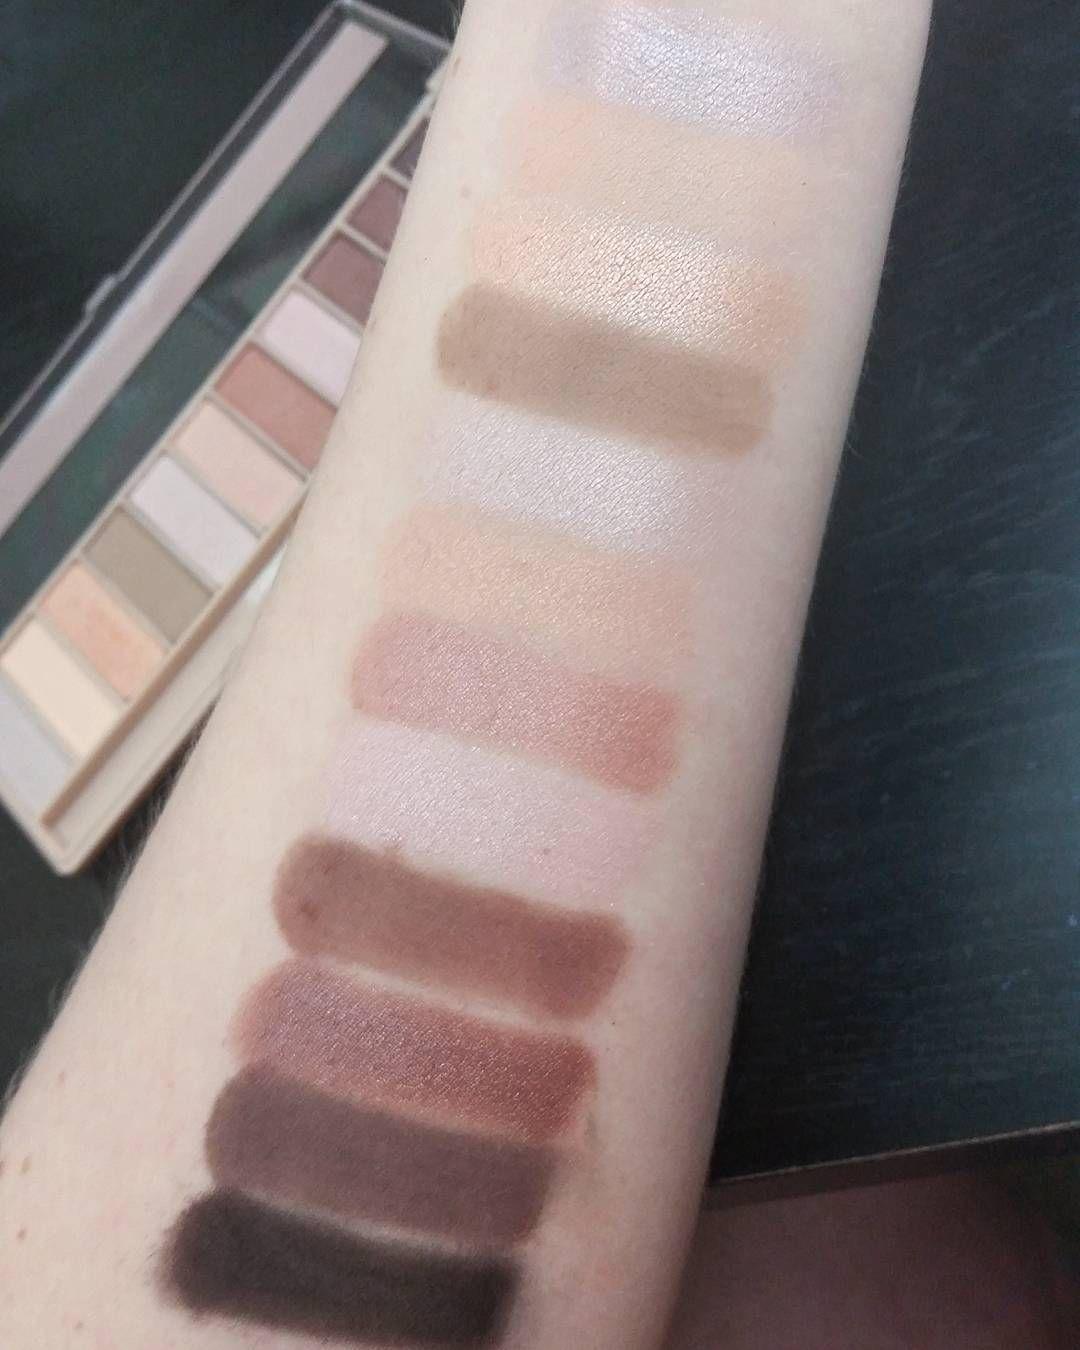 Essential Eyes 28 Color Eyeshadow Palette by BH Cosmetics #3